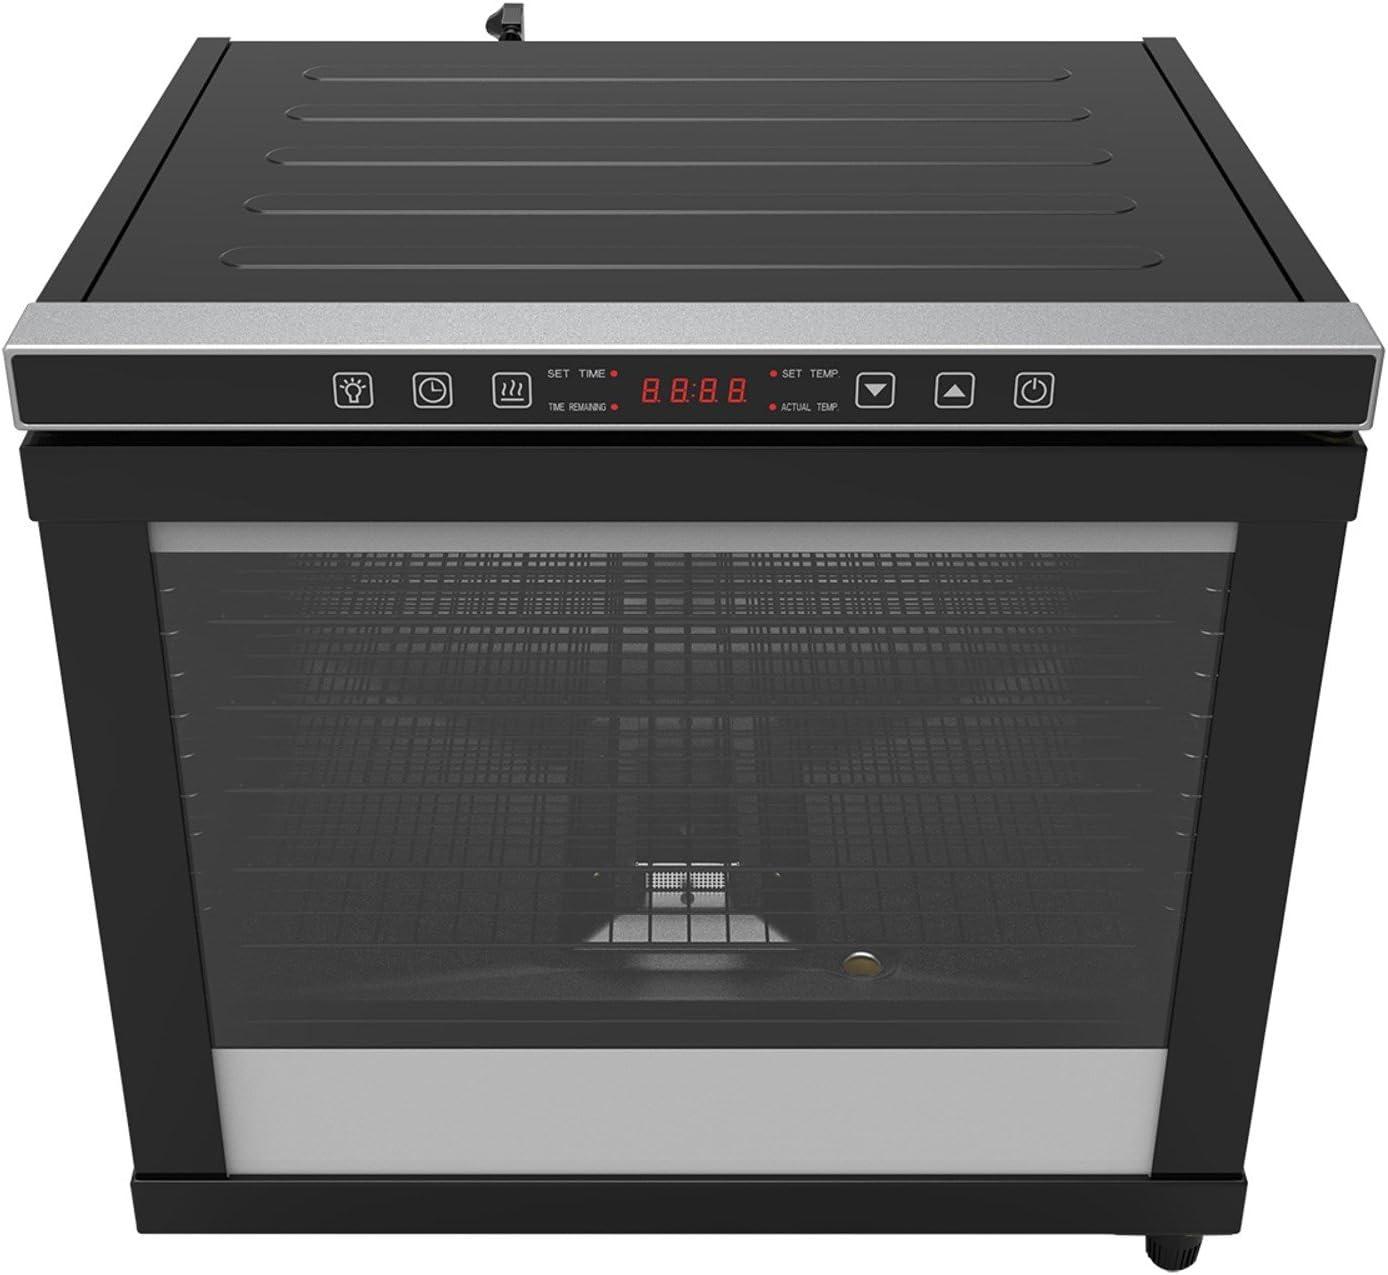 CHARD CD-80C, Pro Power Dehydrator, Black, 80 liter, 12 rack, 1700 watts